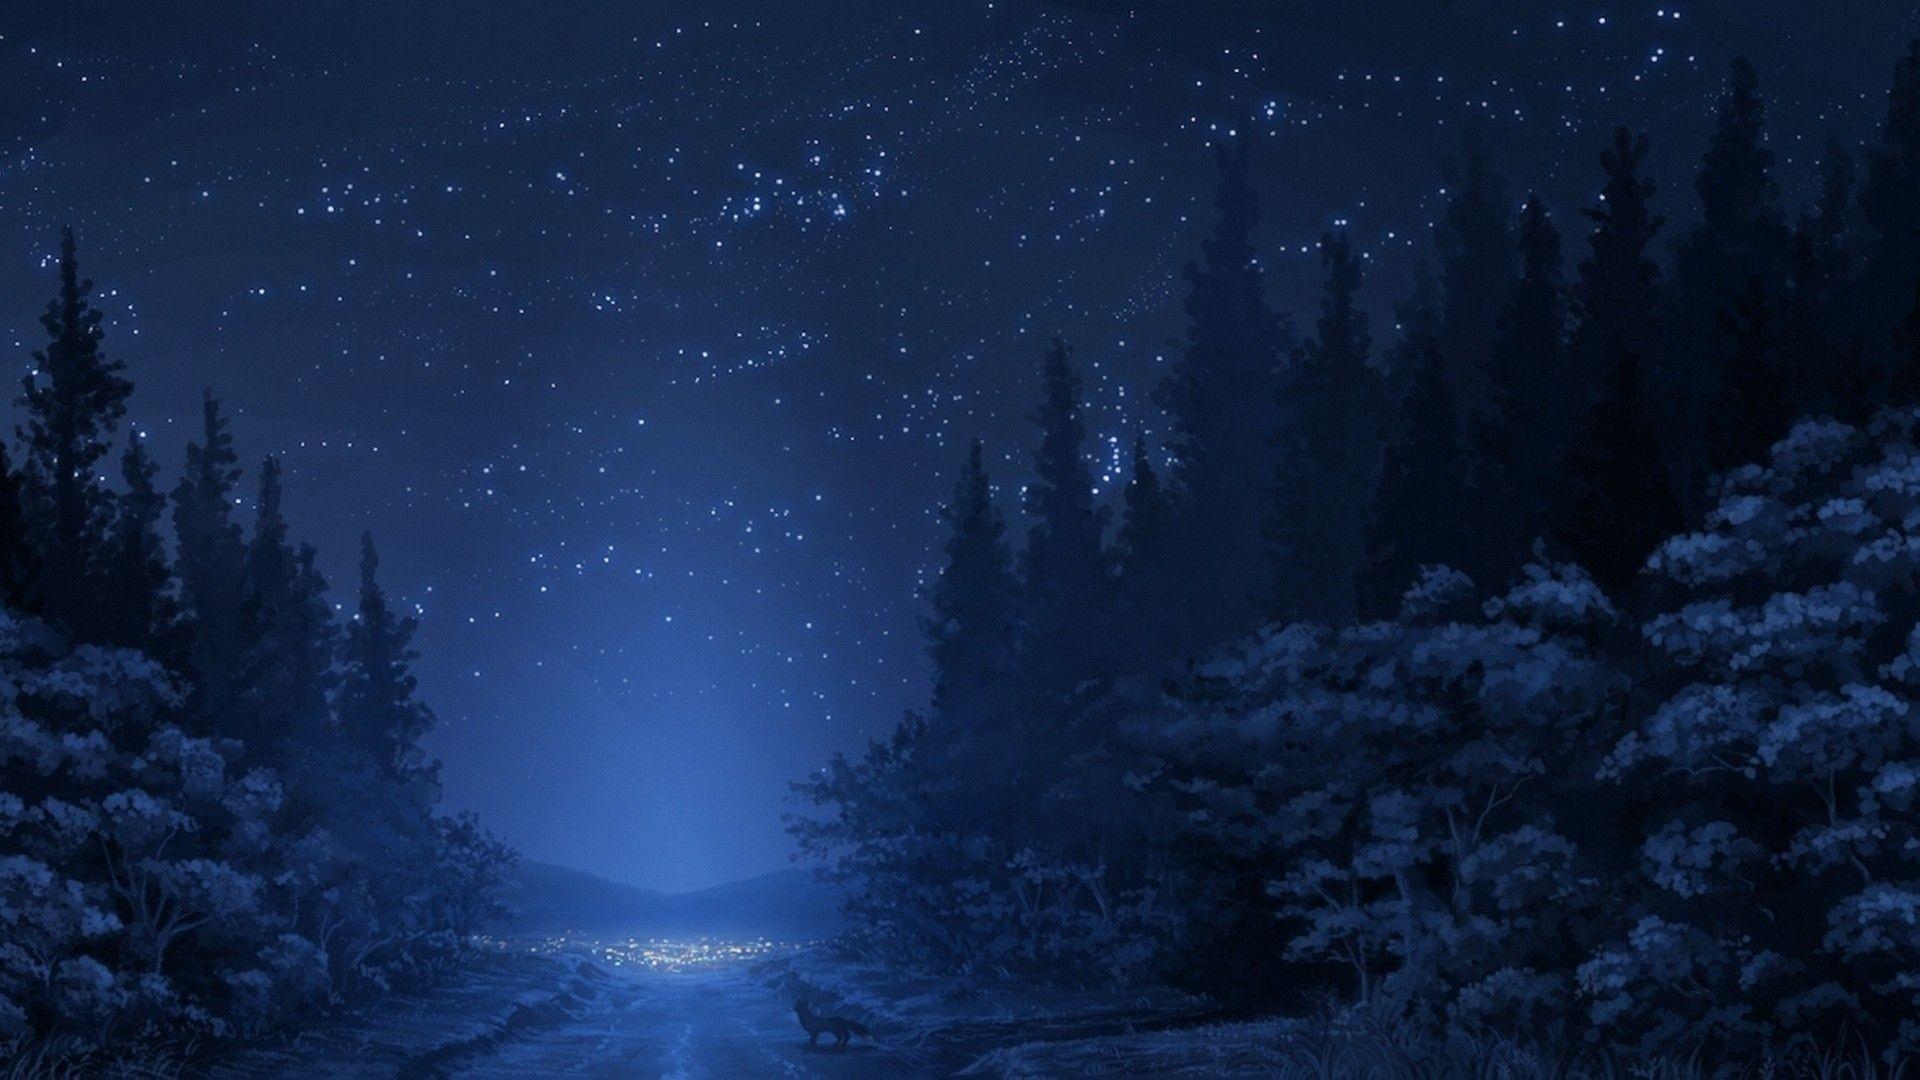 Hd wallpaper · Blue Forest Night – https://www.fullhdwpp.com/nature/